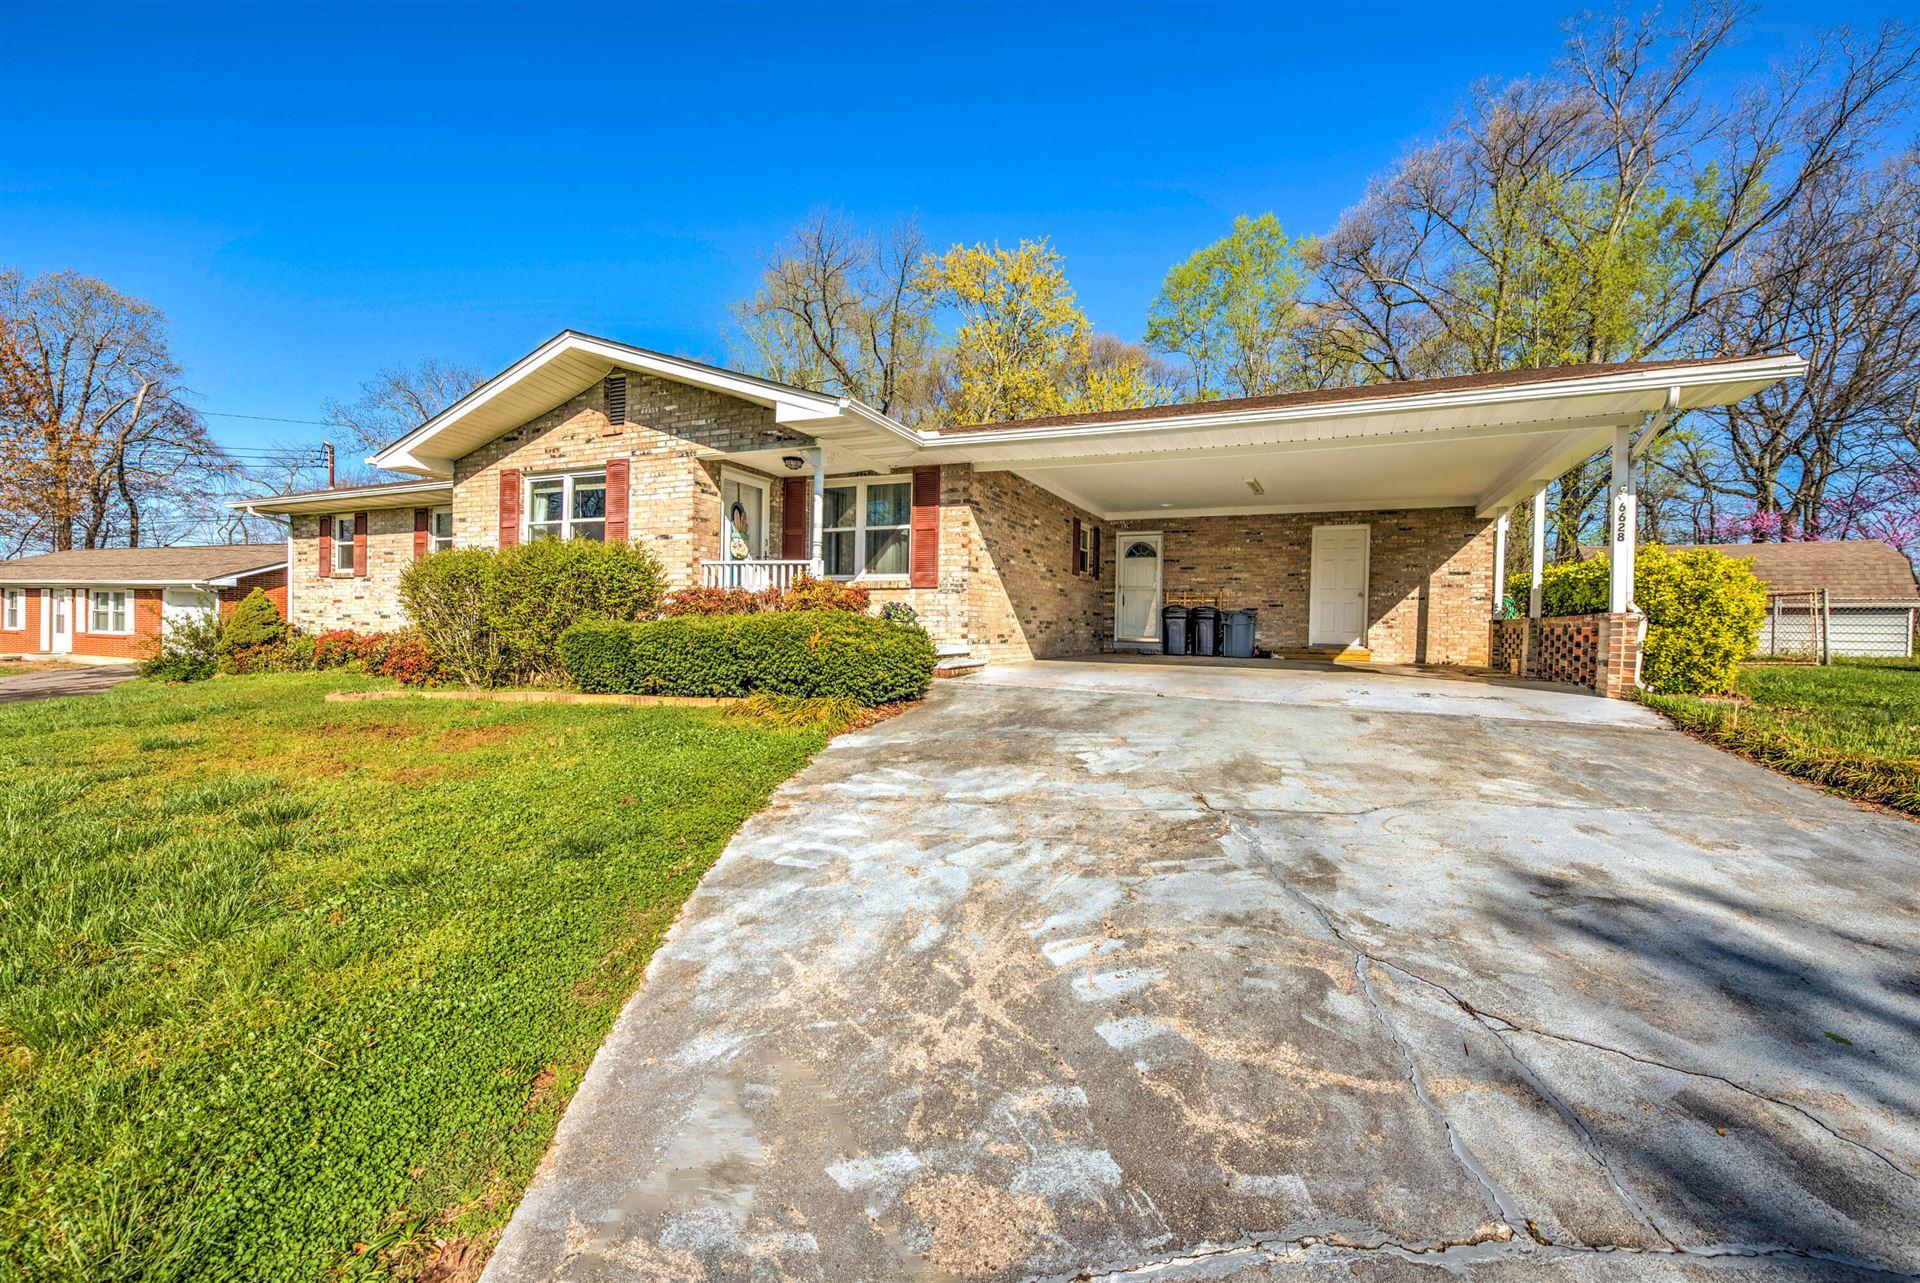 Photo of 6628 Wachese Lane, Knoxville, TN 37912 (MLS # 1147816)